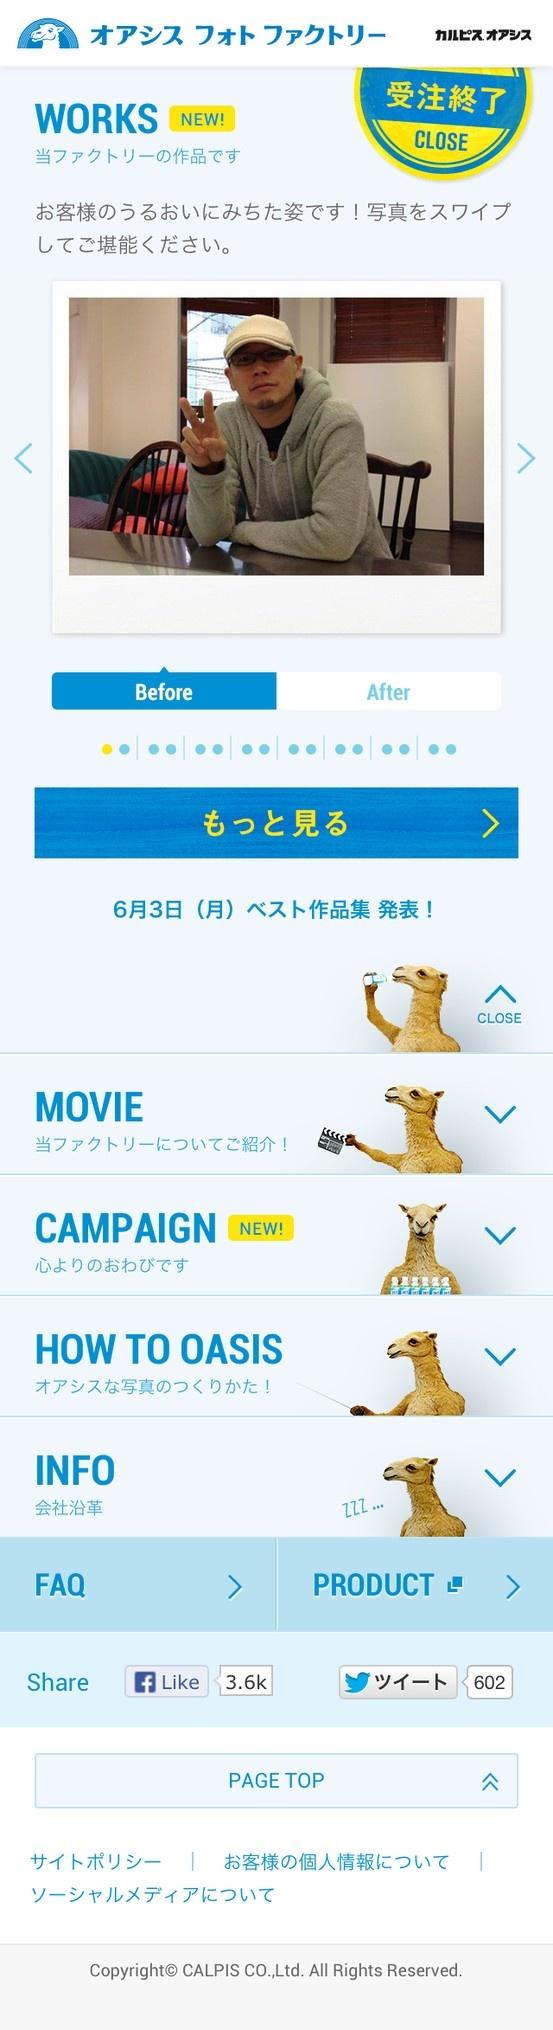 http://oasis.calpis.co.jp/